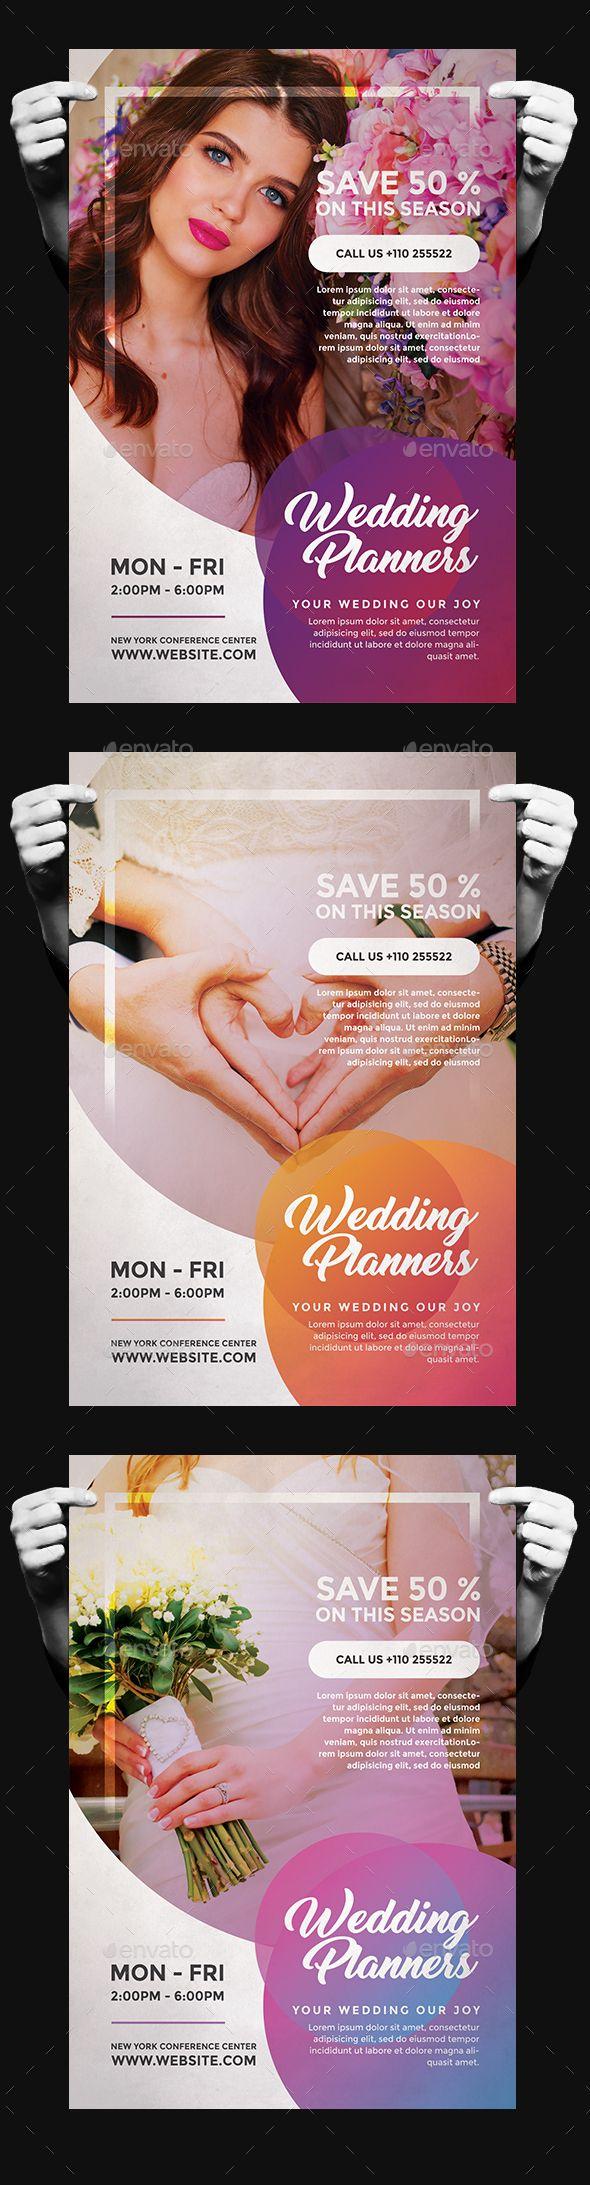 Wedding Planner Flyer Design Template - Commerce Flyers Design Template PSD. Download here: https://graphicriver.net/item/wedding-planner-flyer/19414210?ref=yinkira